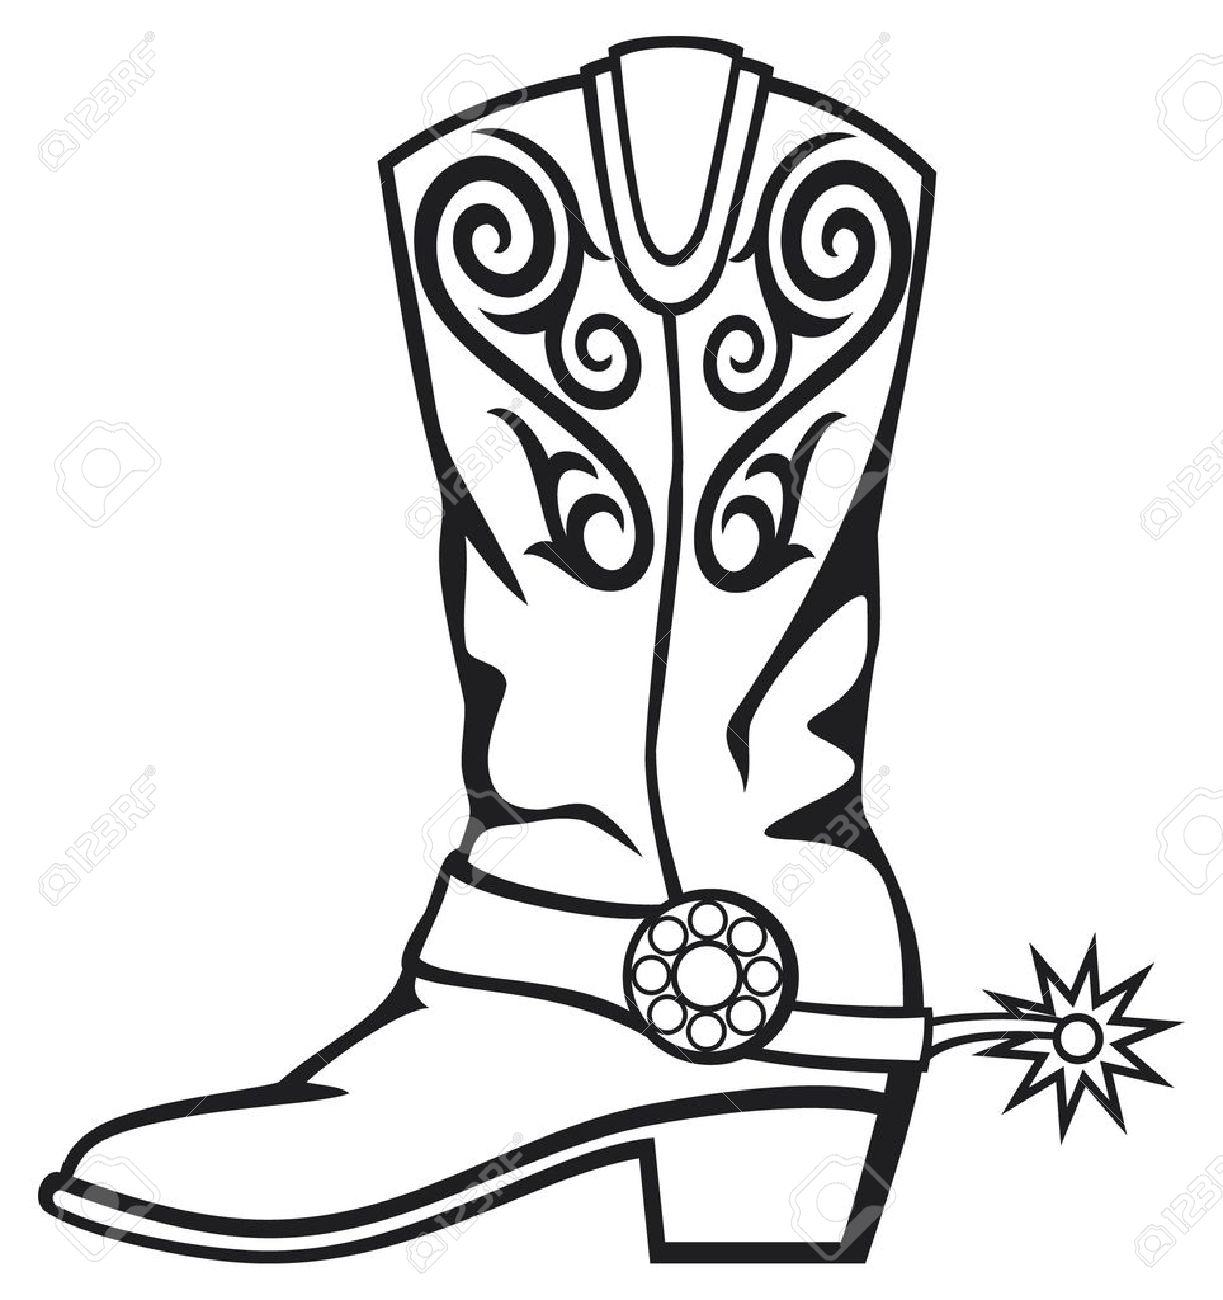 1223x1300 Cartoon Cowboy Boots